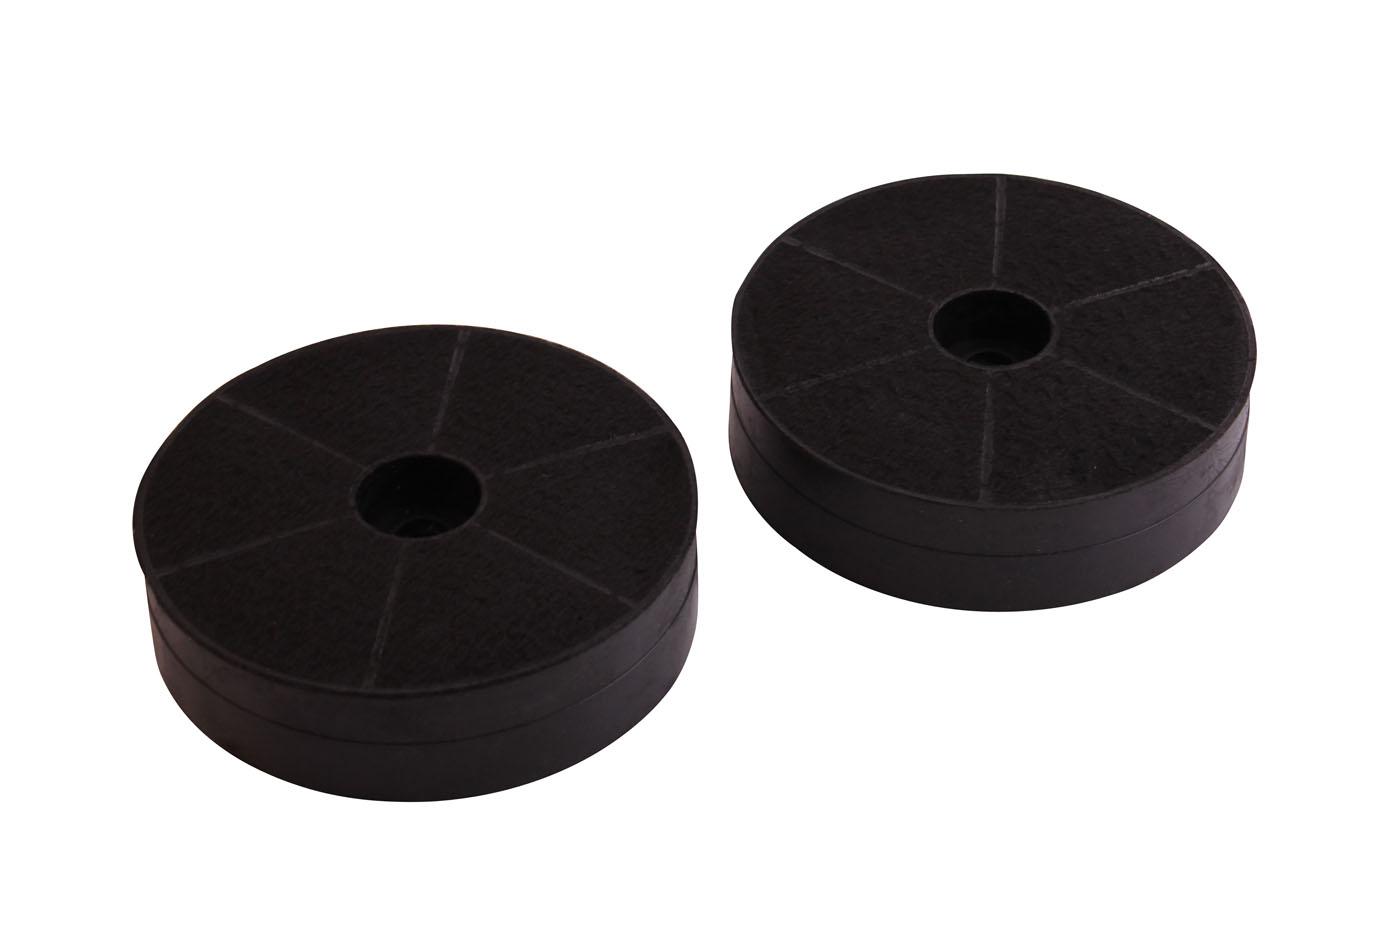 novy filtre filtre de charbon rond 2 pi ces hotte aspirante 508900752. Black Bedroom Furniture Sets. Home Design Ideas